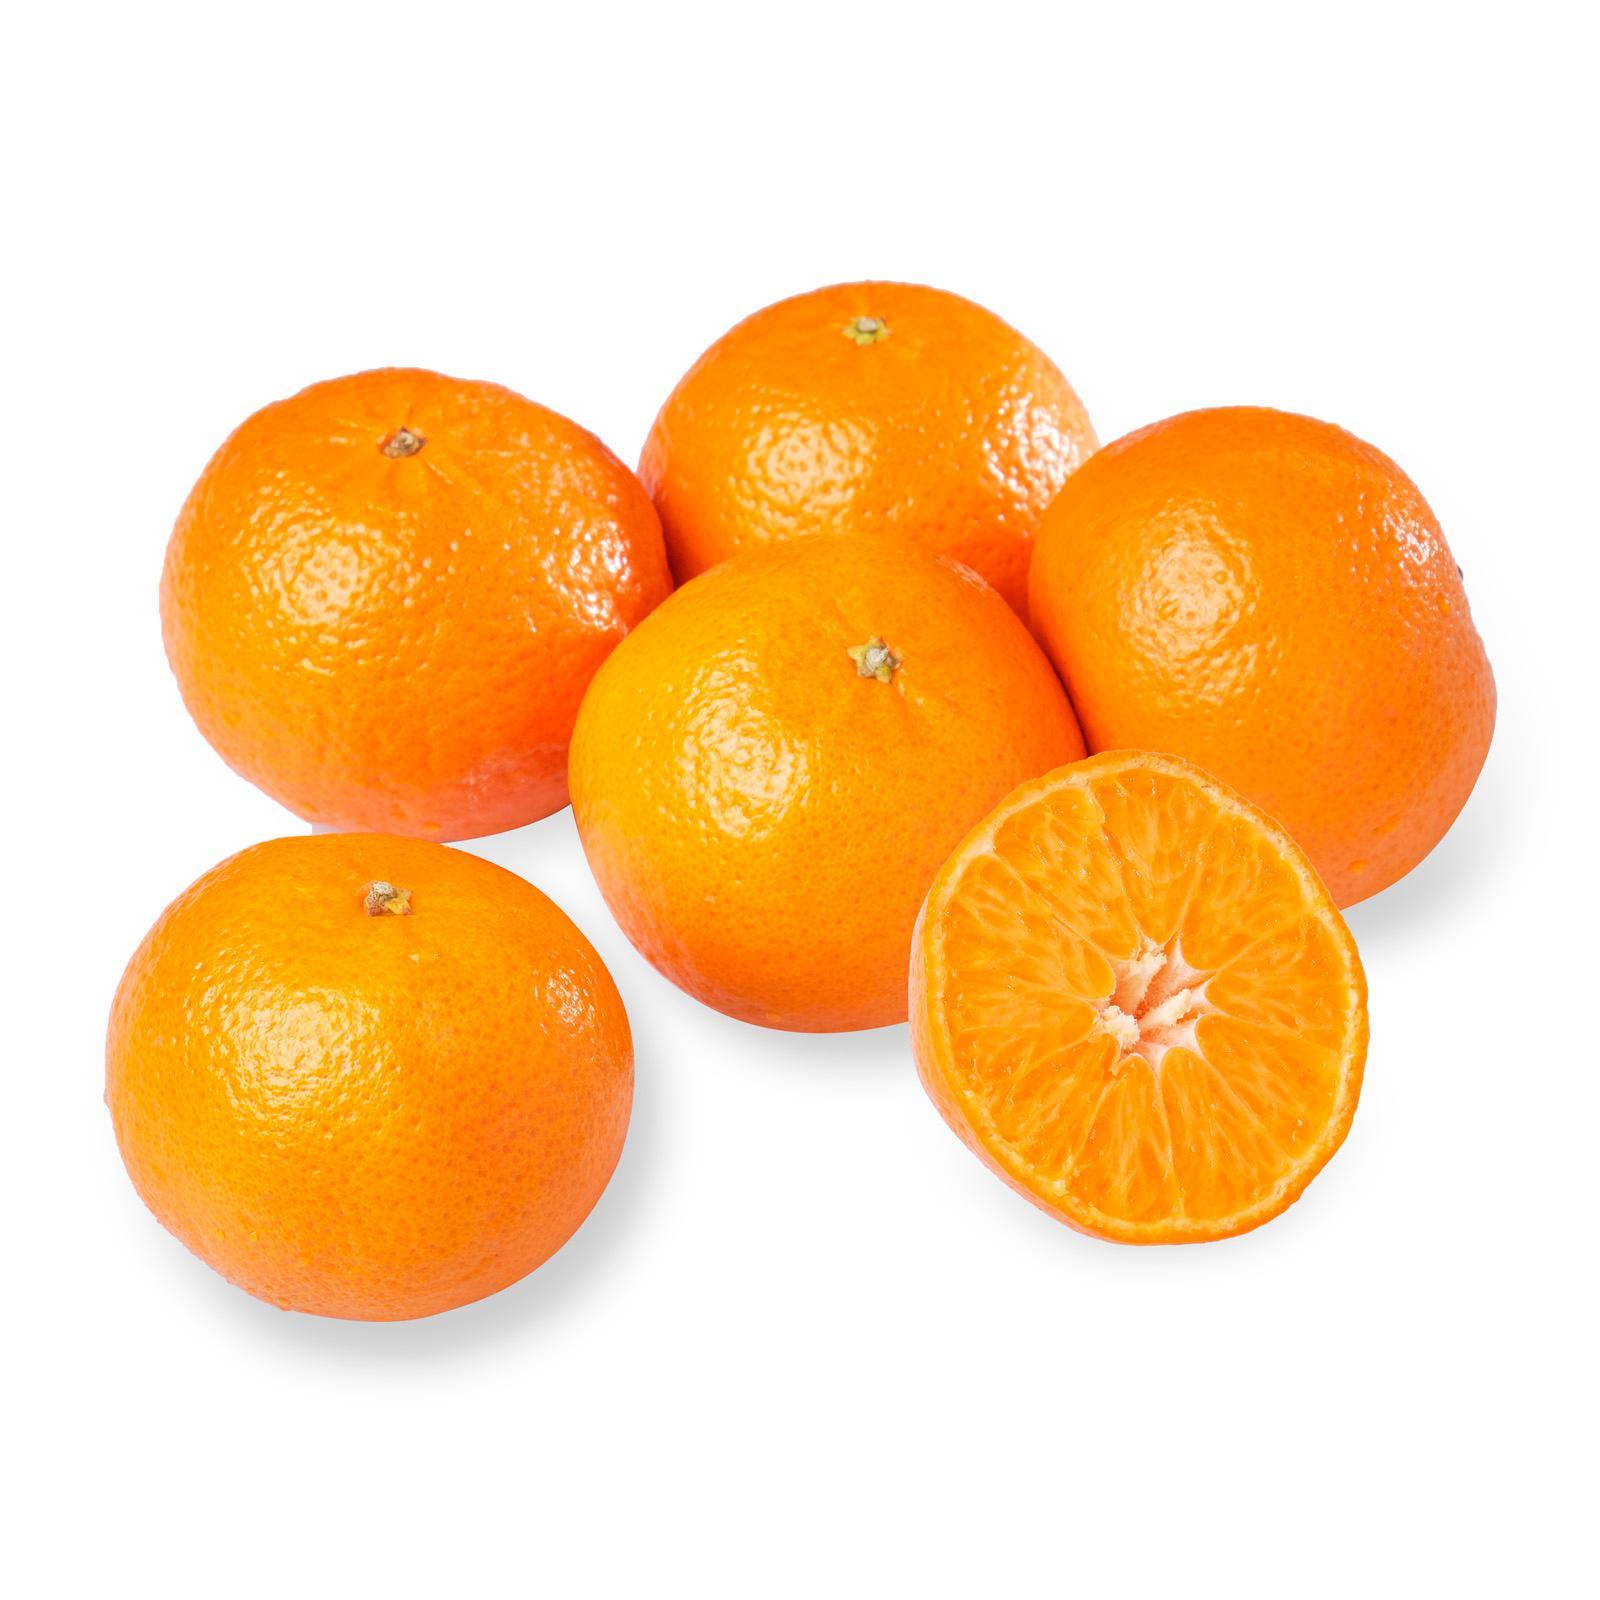 Murcott Mandarins (Large)